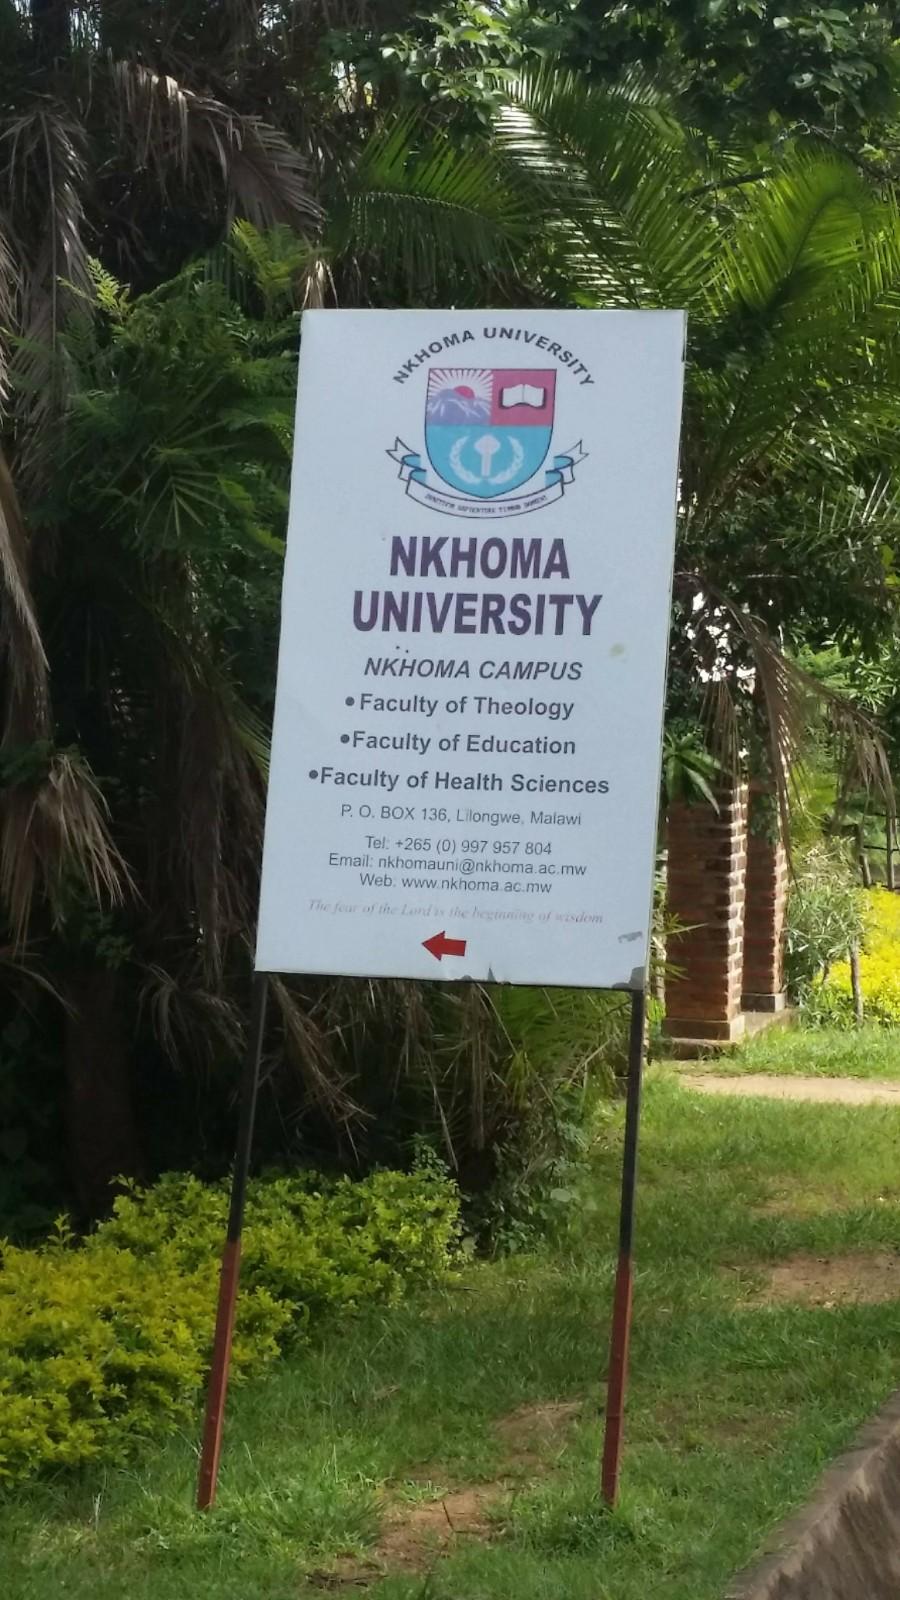 Nkhoma University in Malawi.